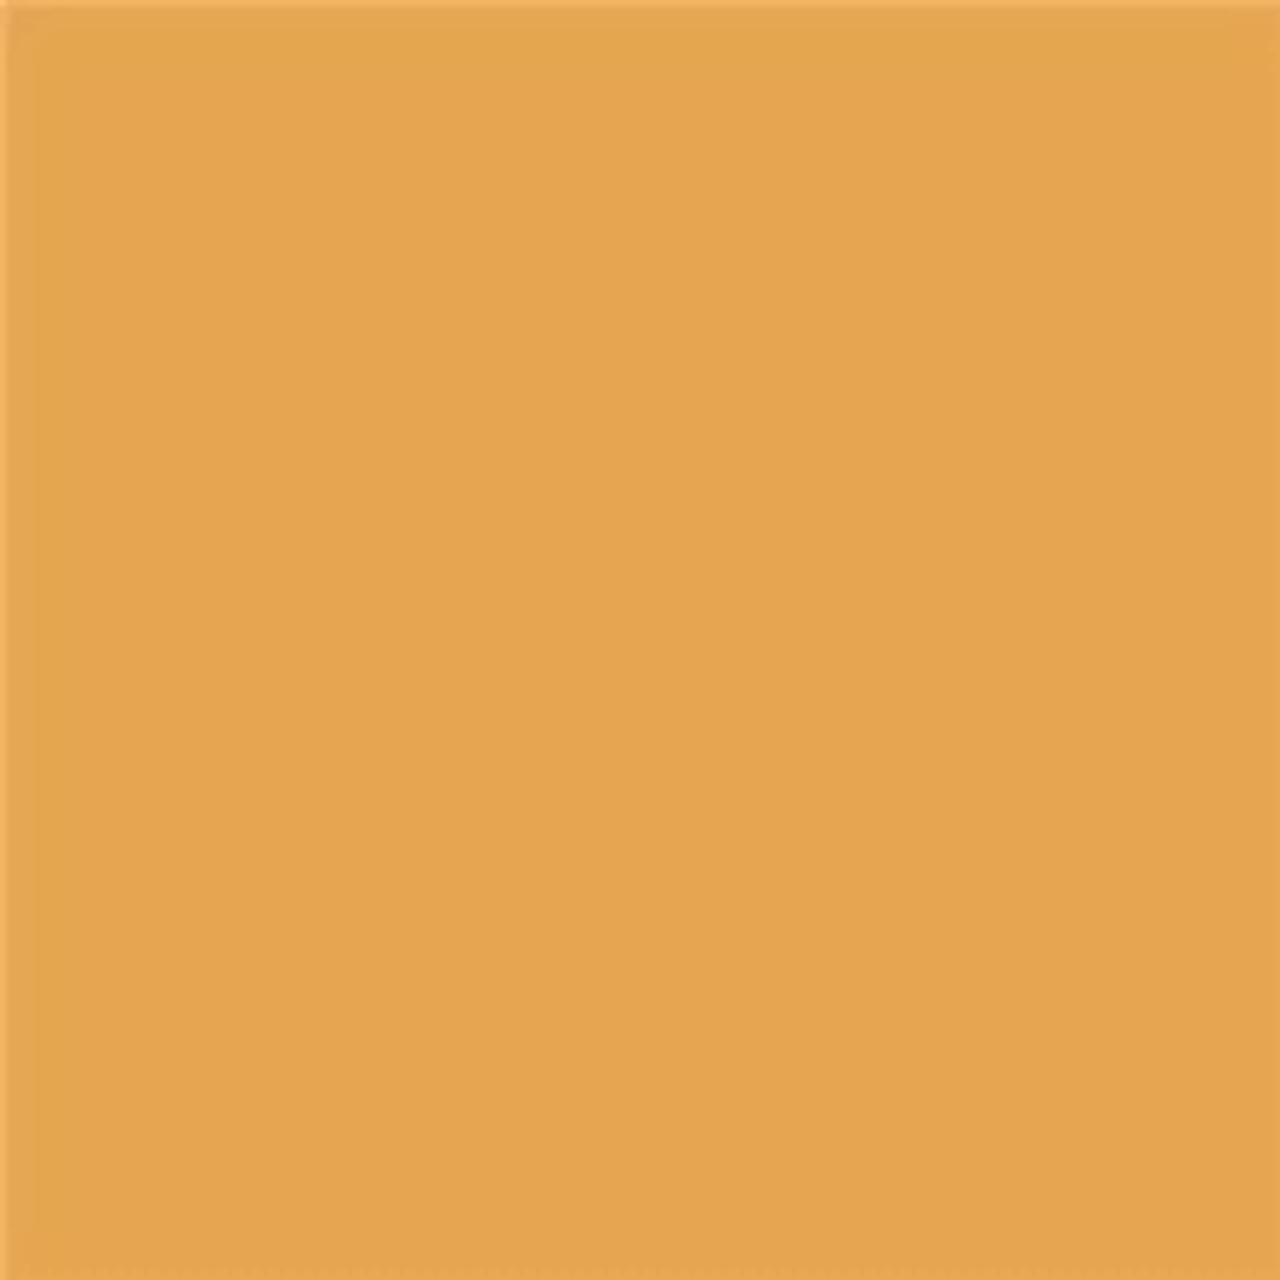 "Lee Filters Rolls #208 Full C.T.Orange + .6 ND 48"" x 25', Gels"